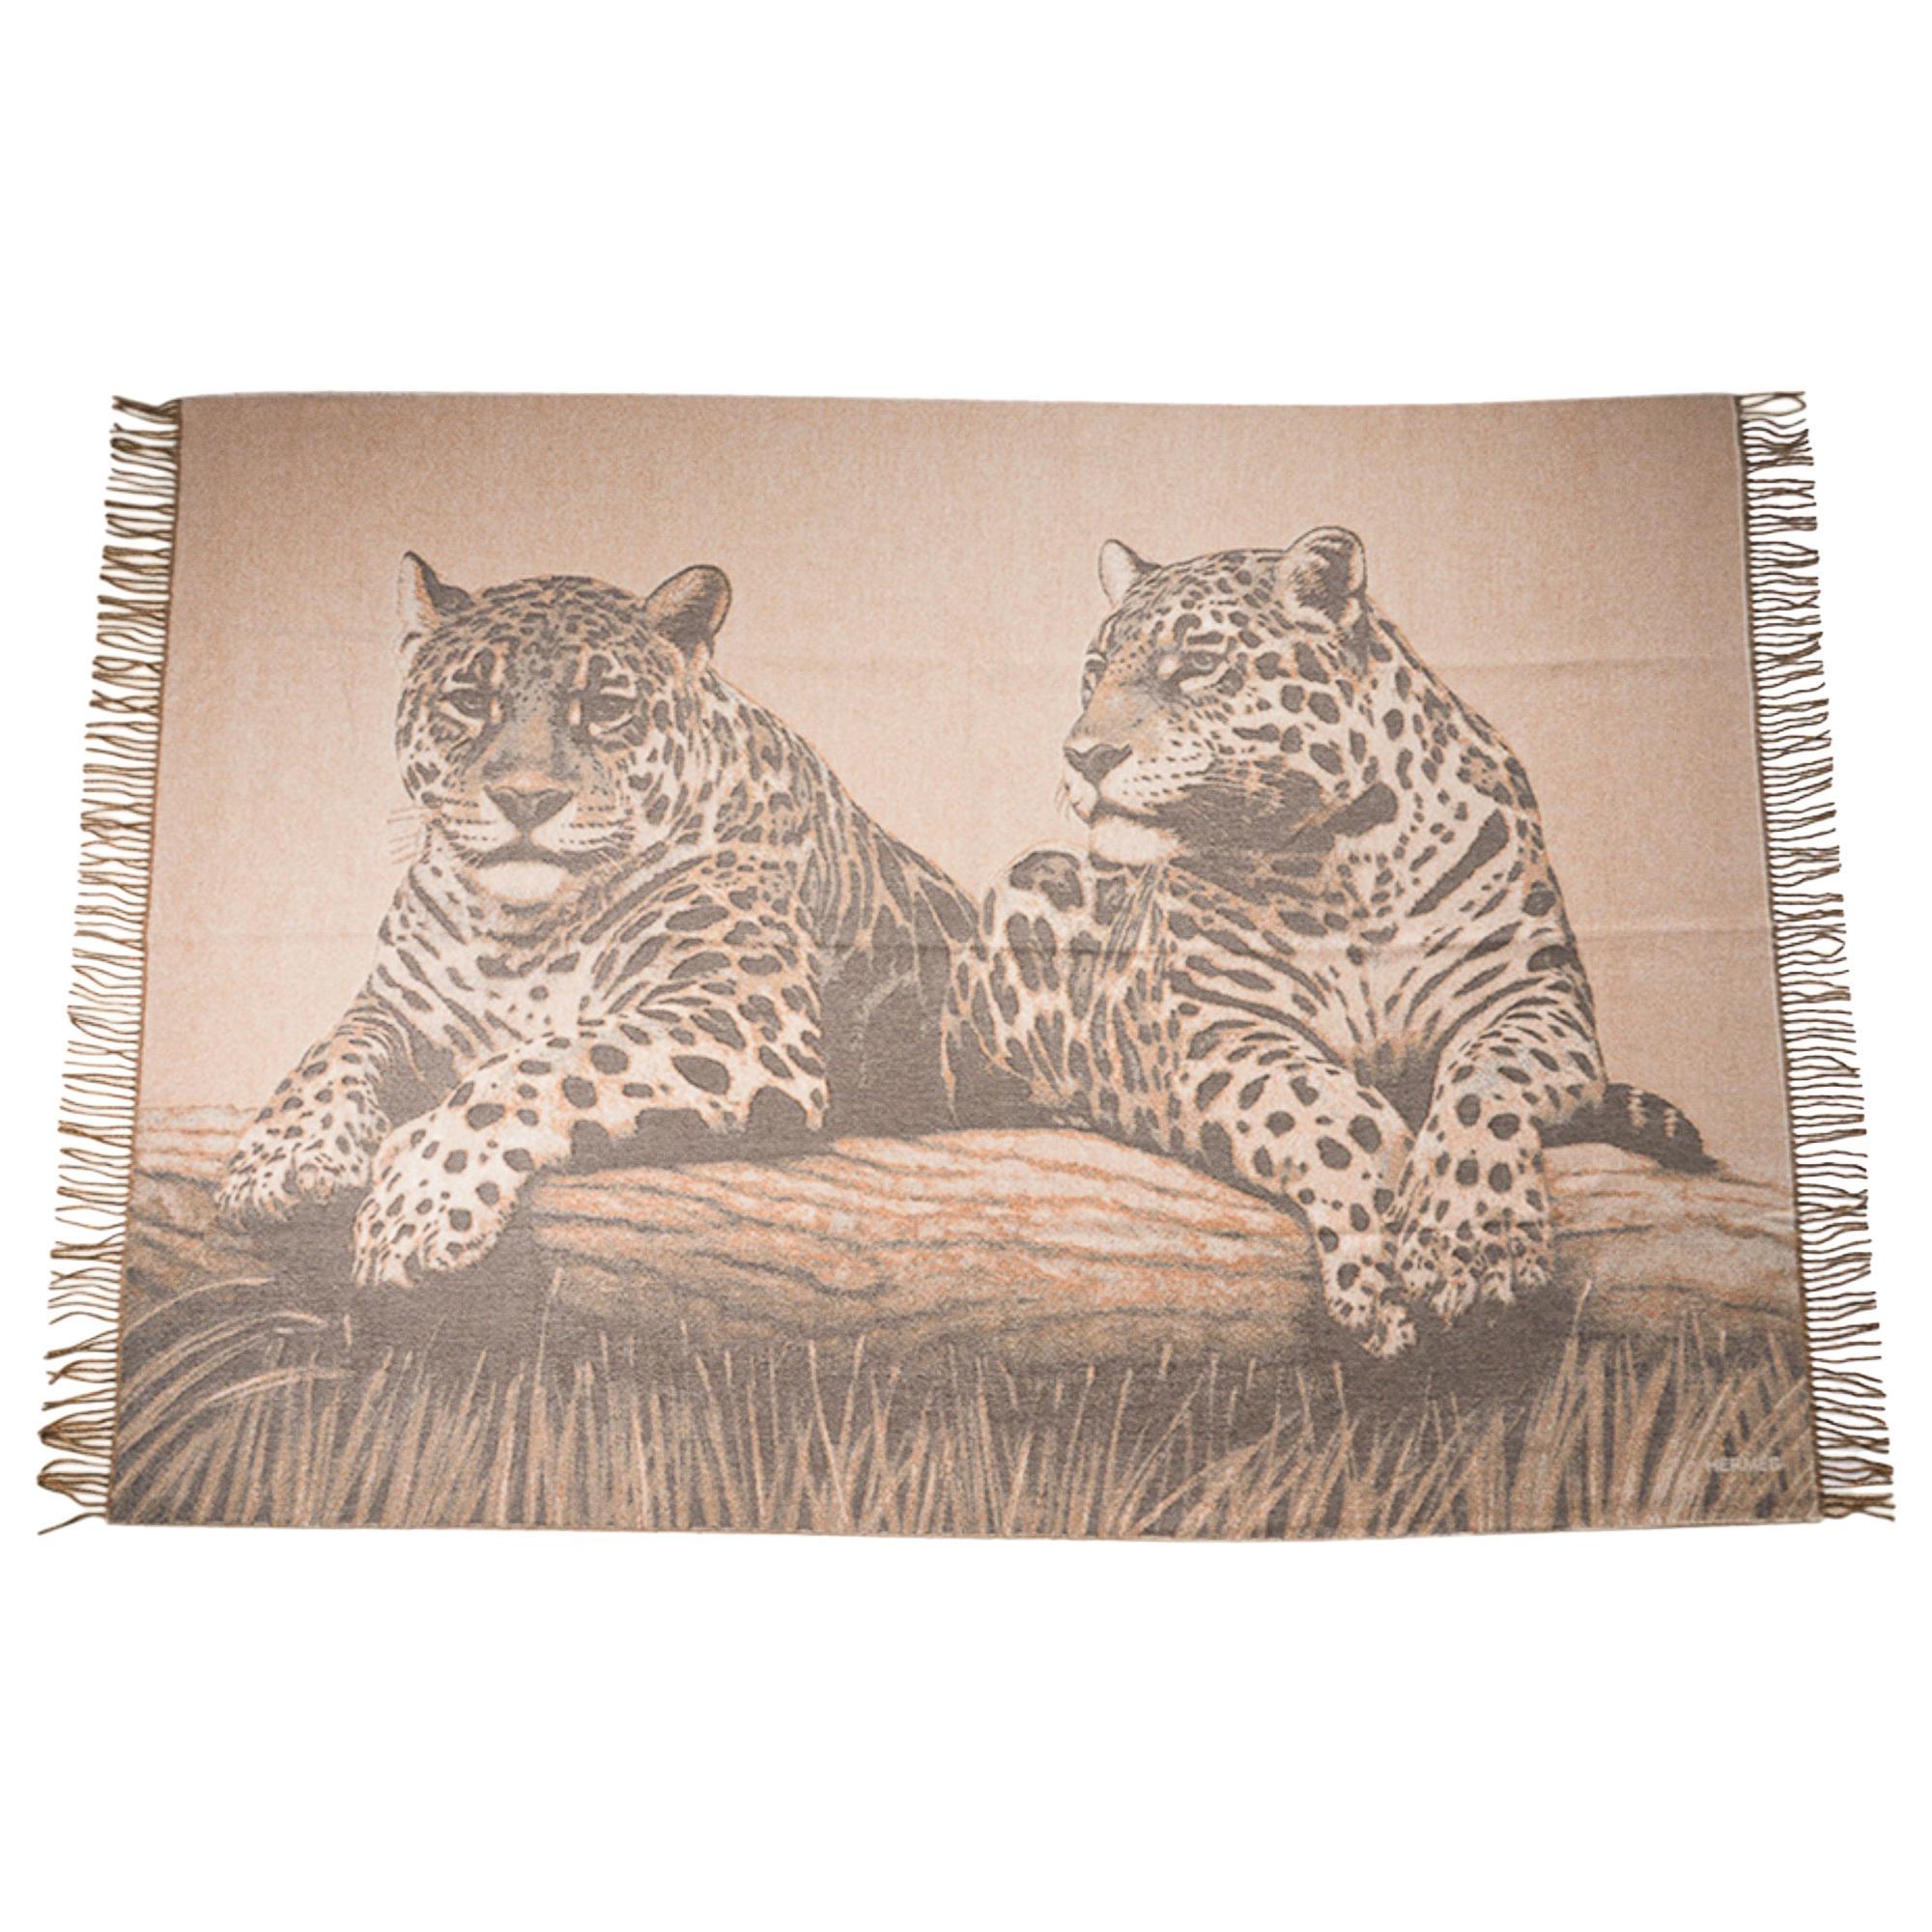 Hermes Jaguars Du Bresil Blanket Naturel Cashmere New w/ Box